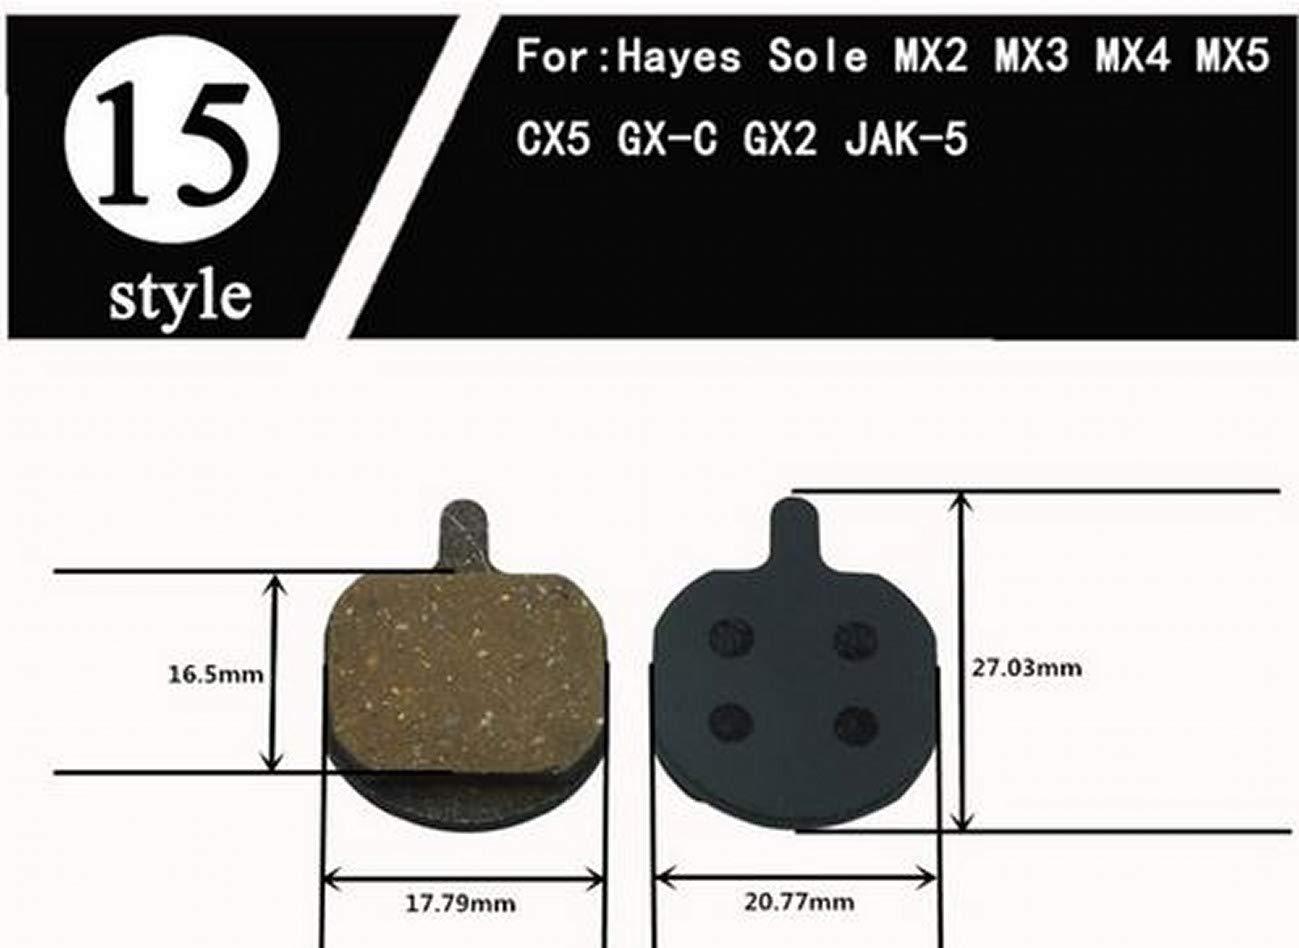 ARUNDEL SERVICES EU 2 Pares de Pastillas de Freno para Bicicleta de monta/ña para Hayes Sole MX2 MX3 MX4 CX5 GX-C GX2 Jak-5 Pastillas de Freno Almohadillas de Disco Bicicleta Frenos